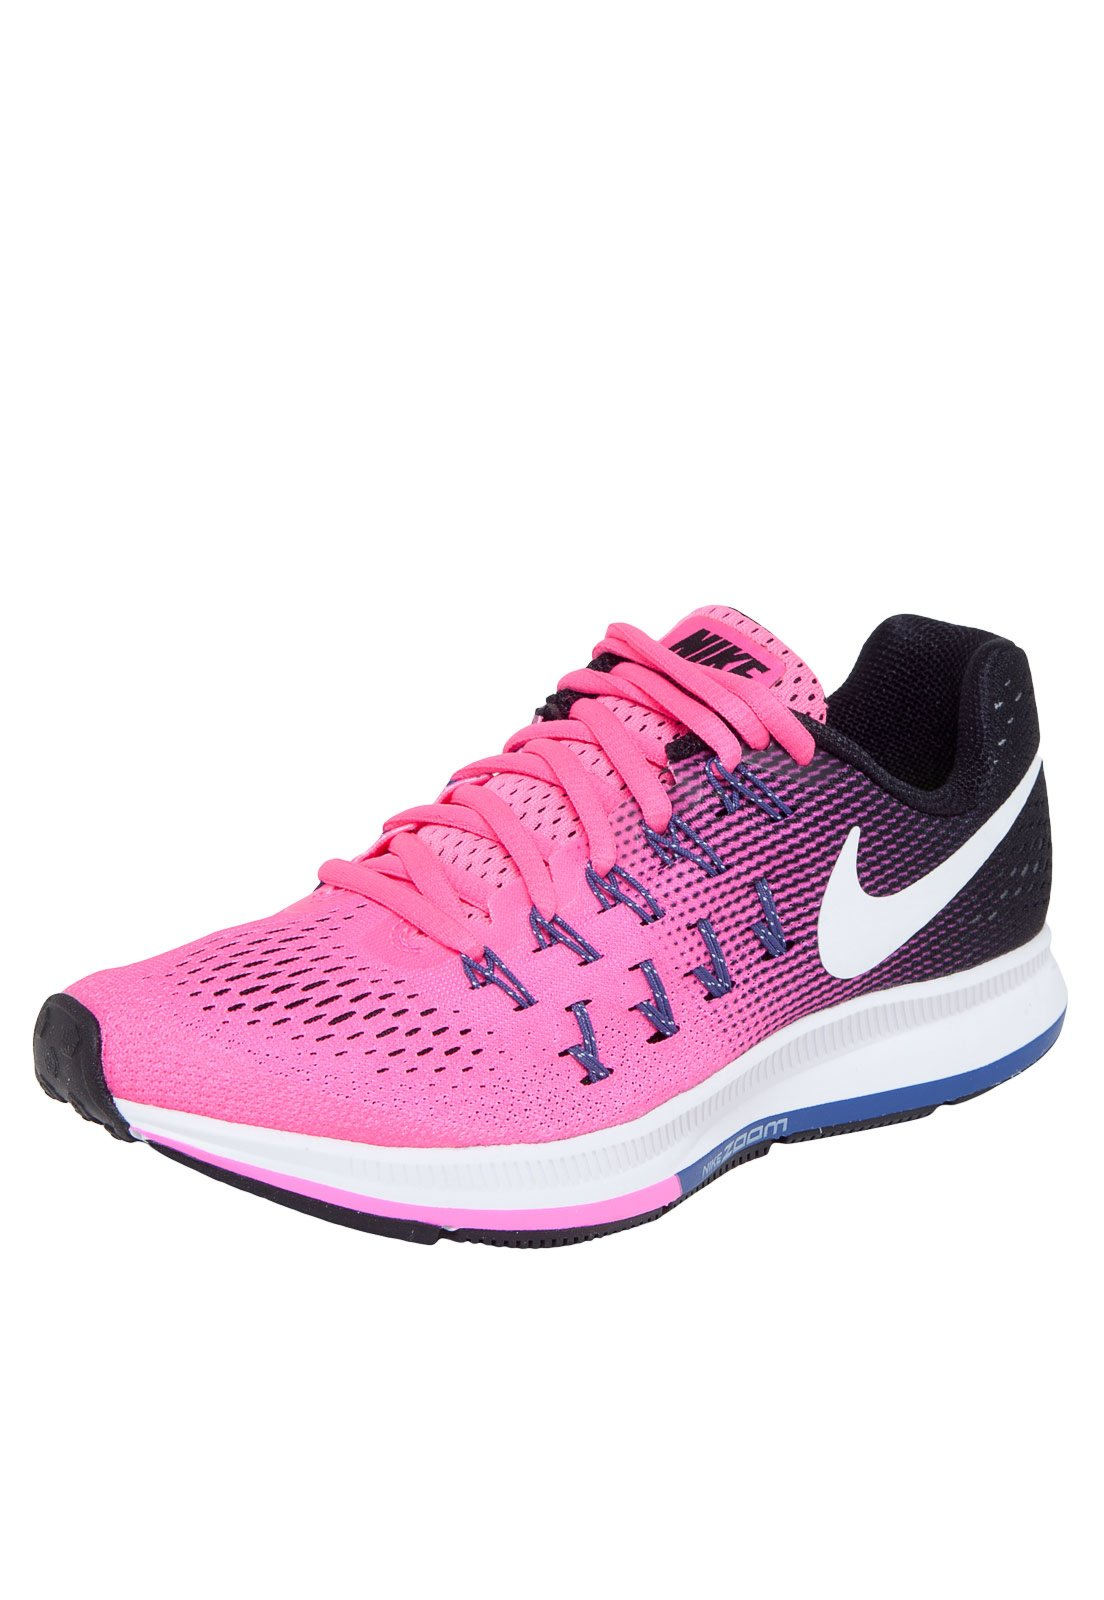 Hola Colaborar con variable  Tênis Nike Sportswear Wmns Air Zoom Pegasus 33 Rosa/Preto - Compre Agora |  Dafiti Brasil